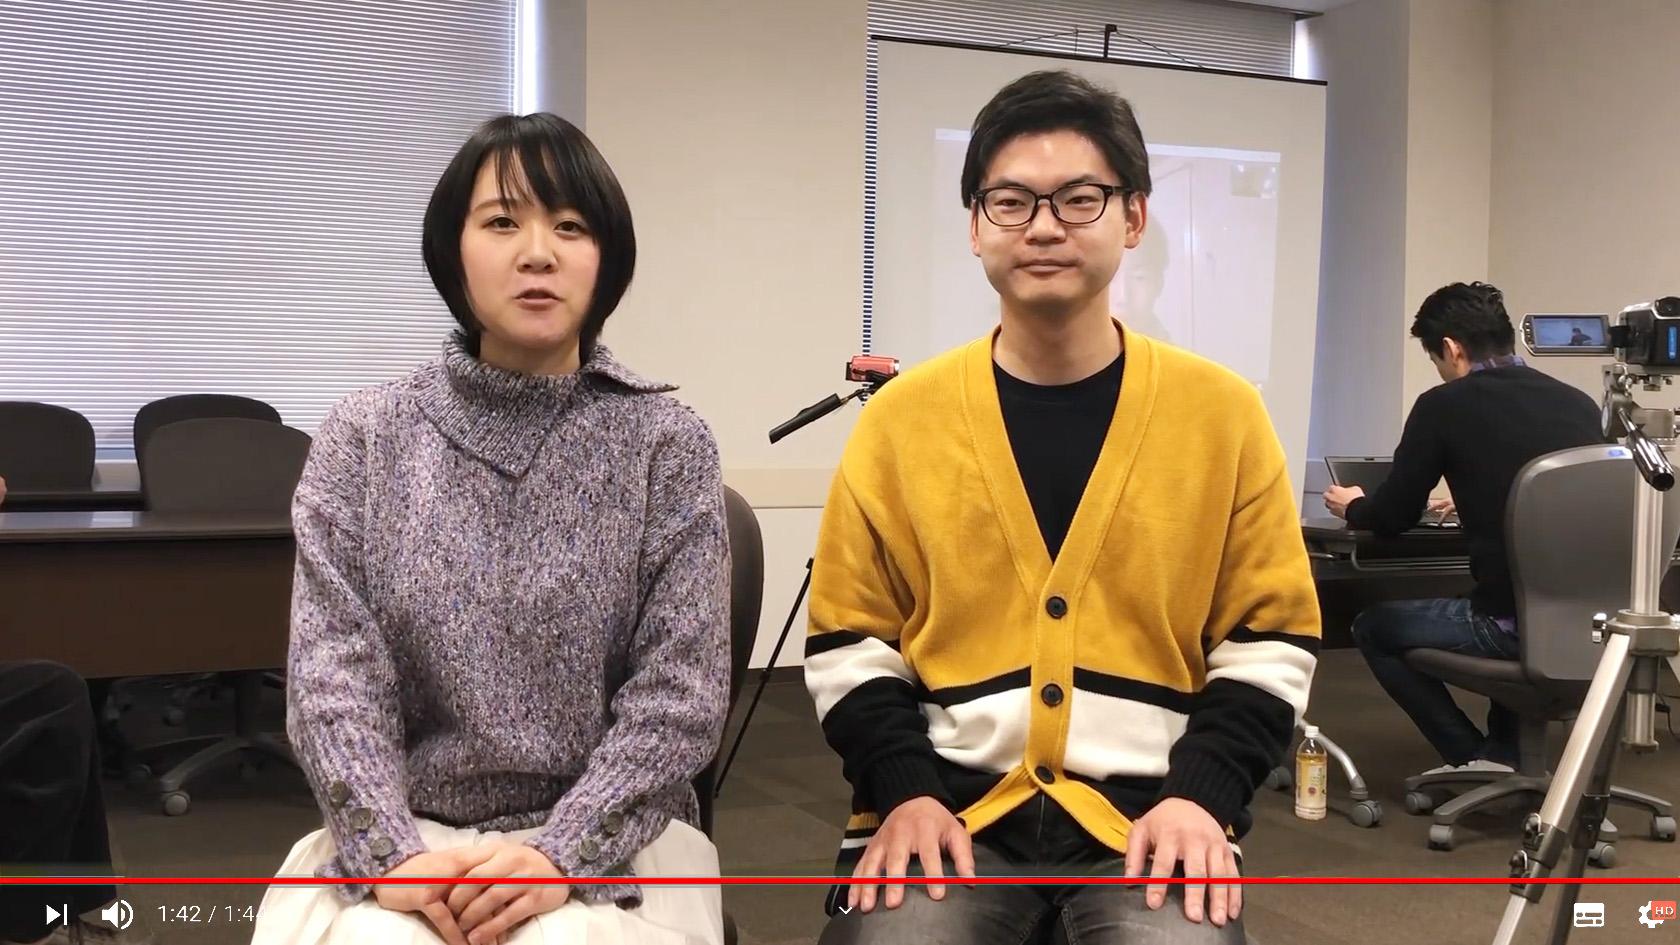 dokkyo-news.com ライブニュース:ブンデスリーグの日本人デスク目指して!